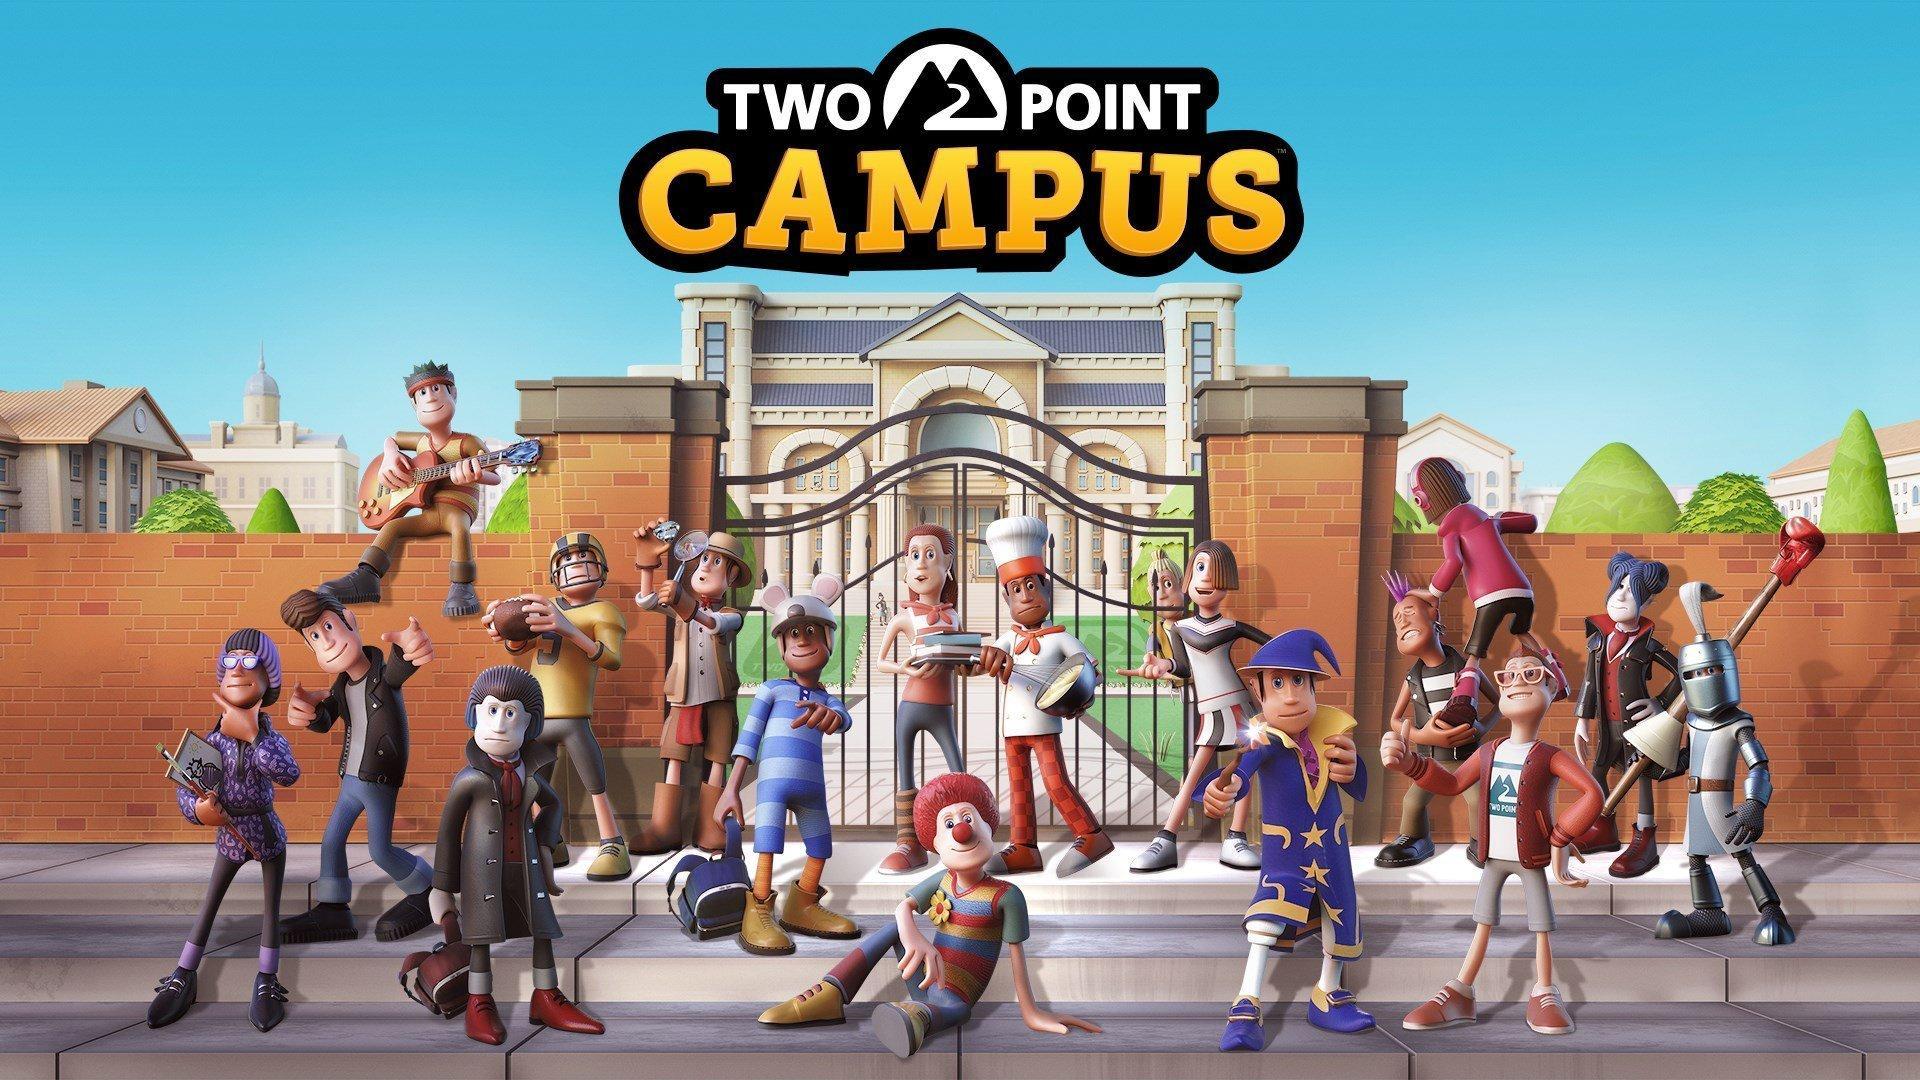 Утечка: Two Point Campus появилась в магазине Microsoft Store, до официального анонса 5